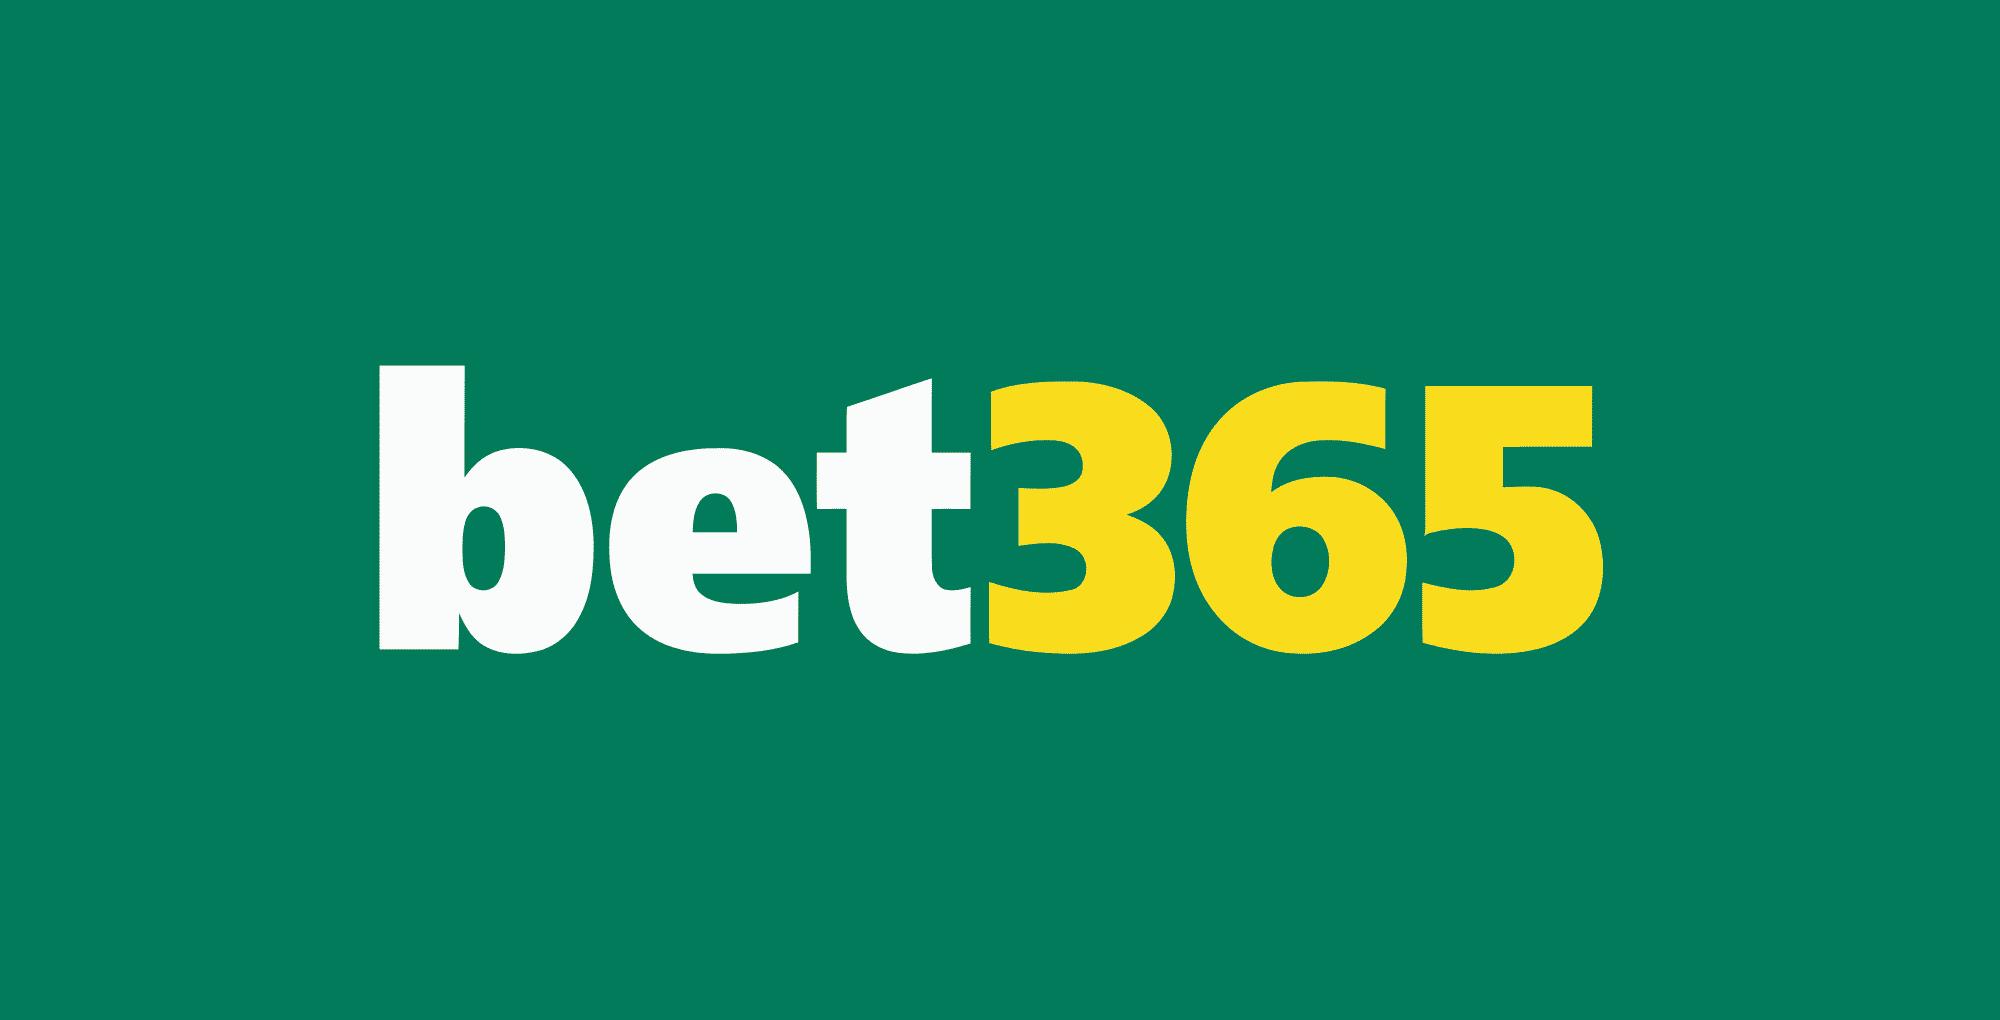 bet365 bookmaker logo